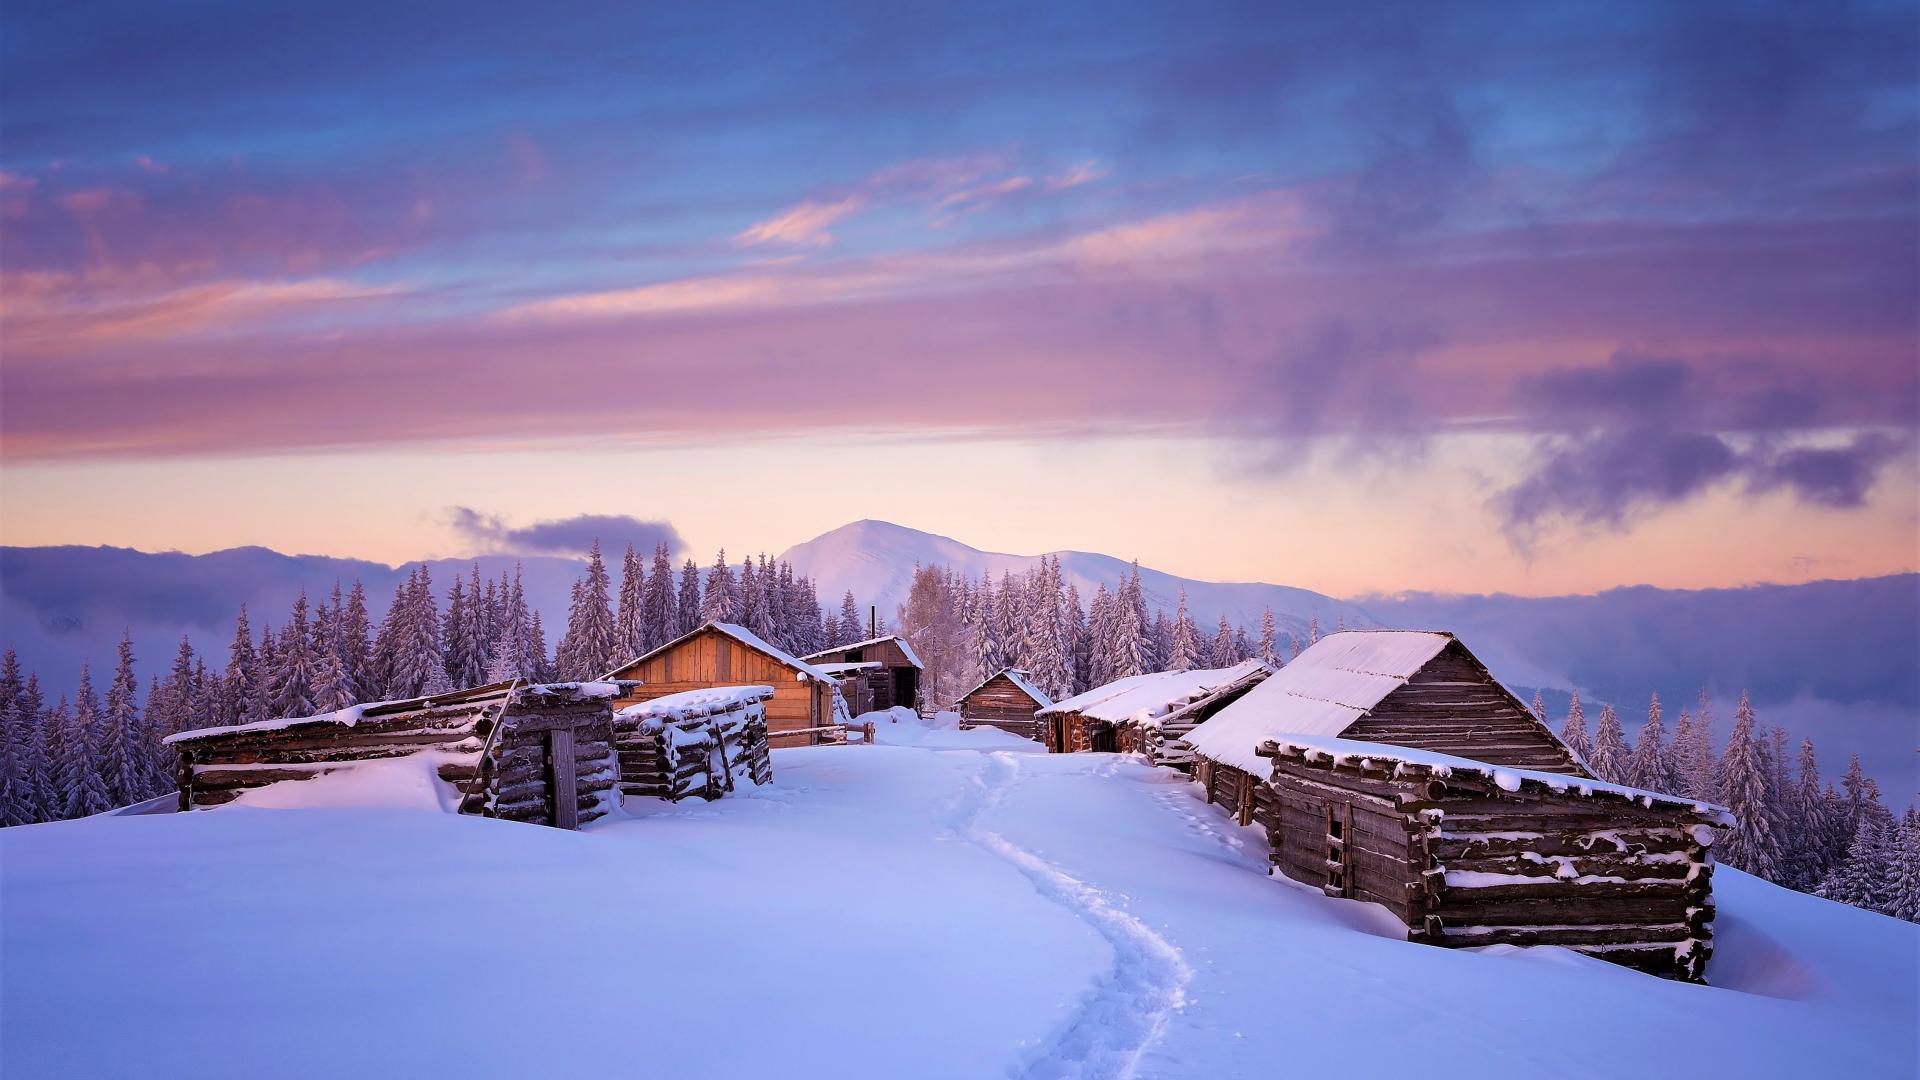 Download 1920x1080 wallpaper houses winter landscape - Wallpaper hd nature winter ...